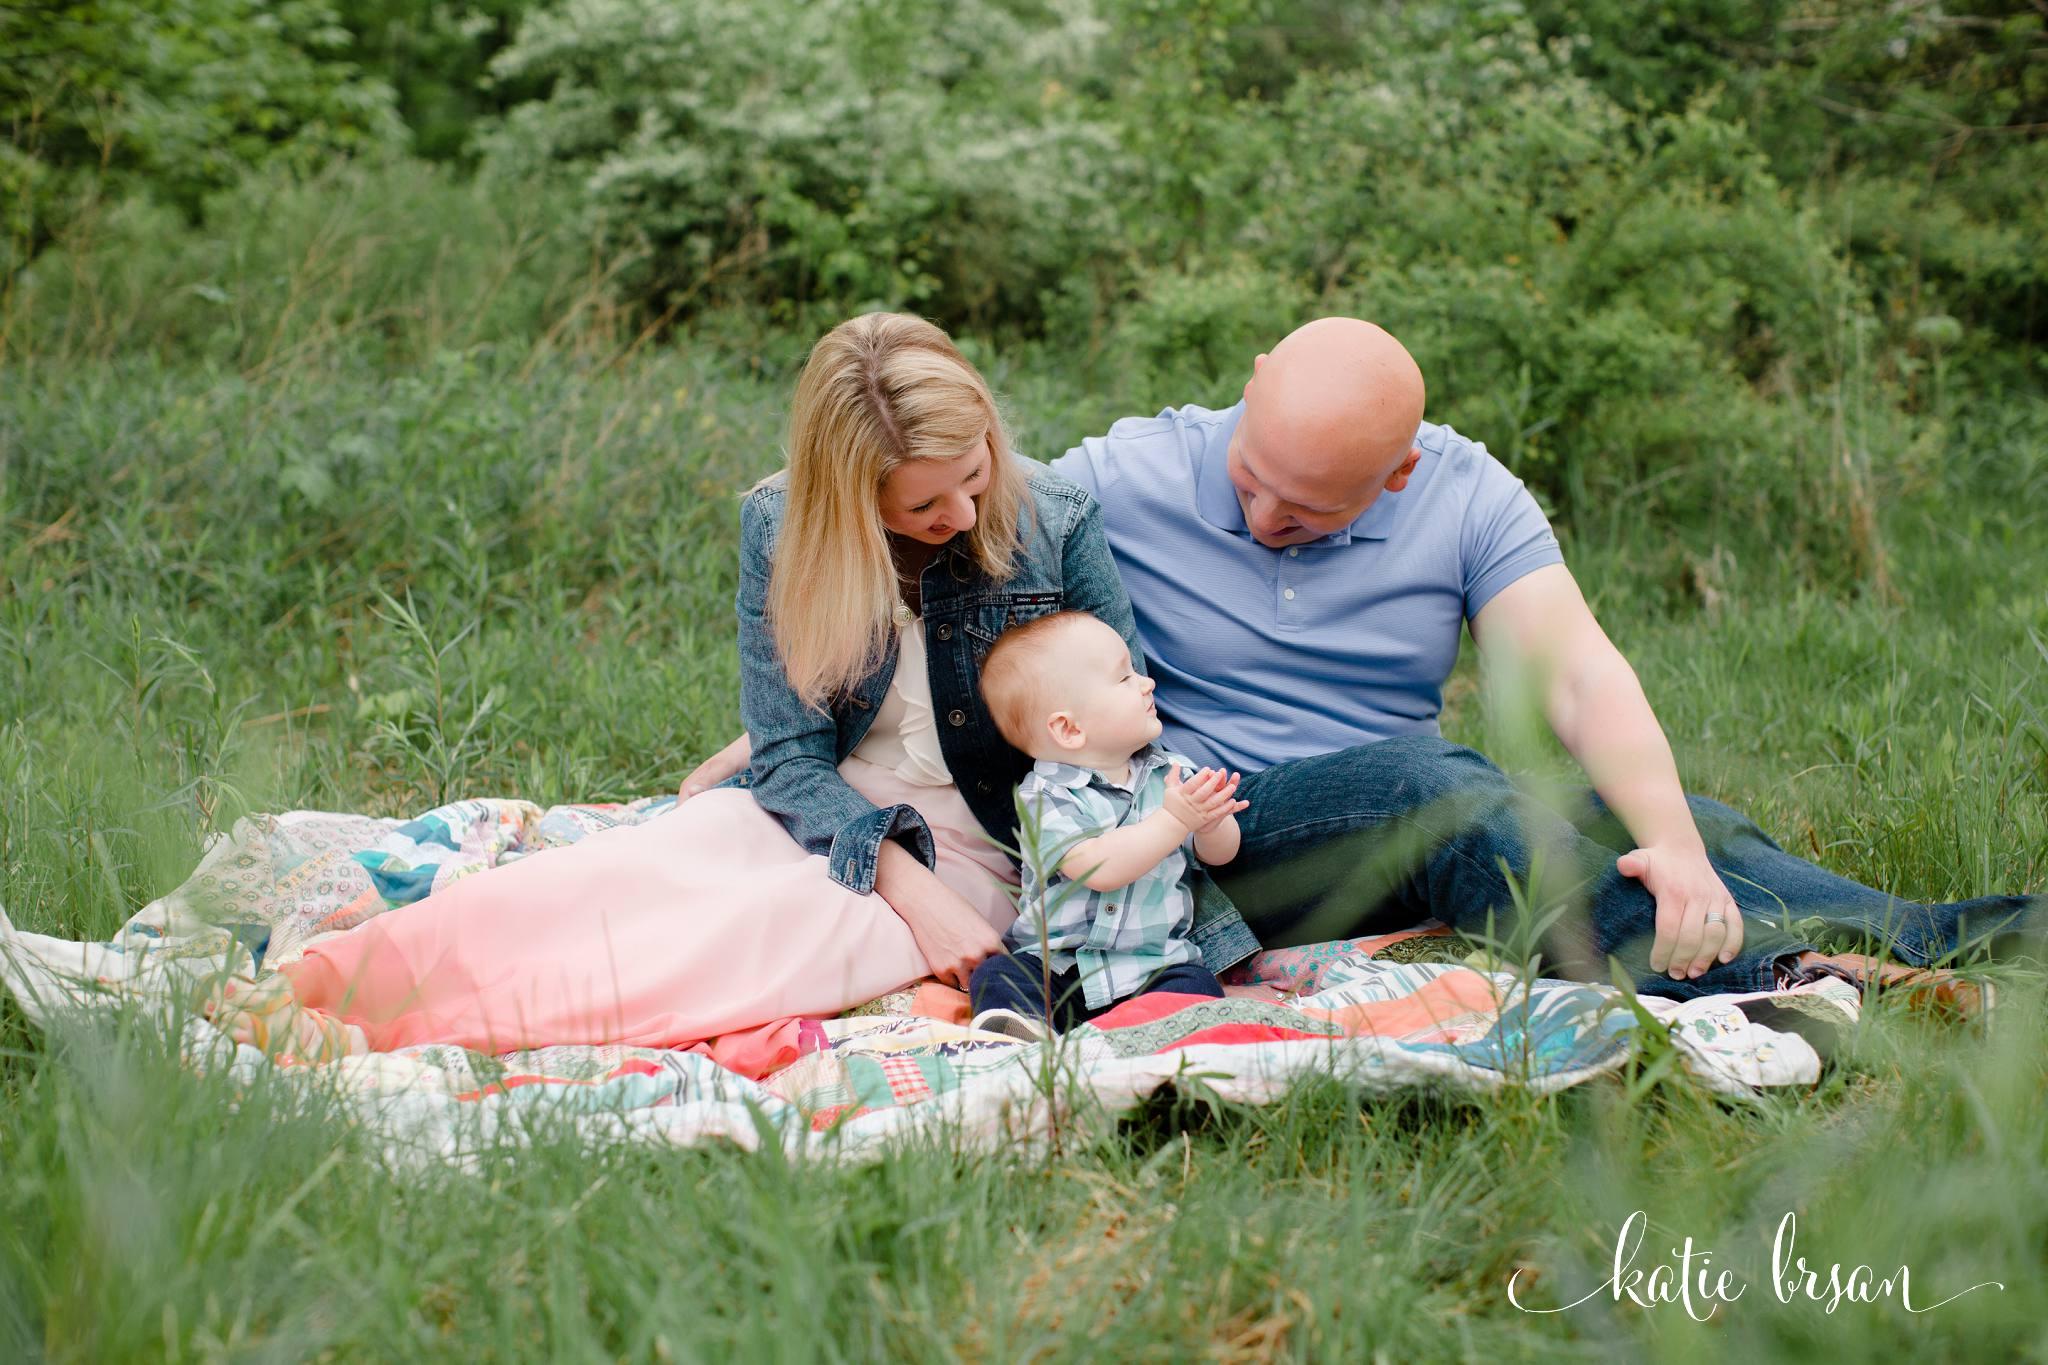 Mokena_FamilyPhotographer_9month_milestone_session_1467.jpg